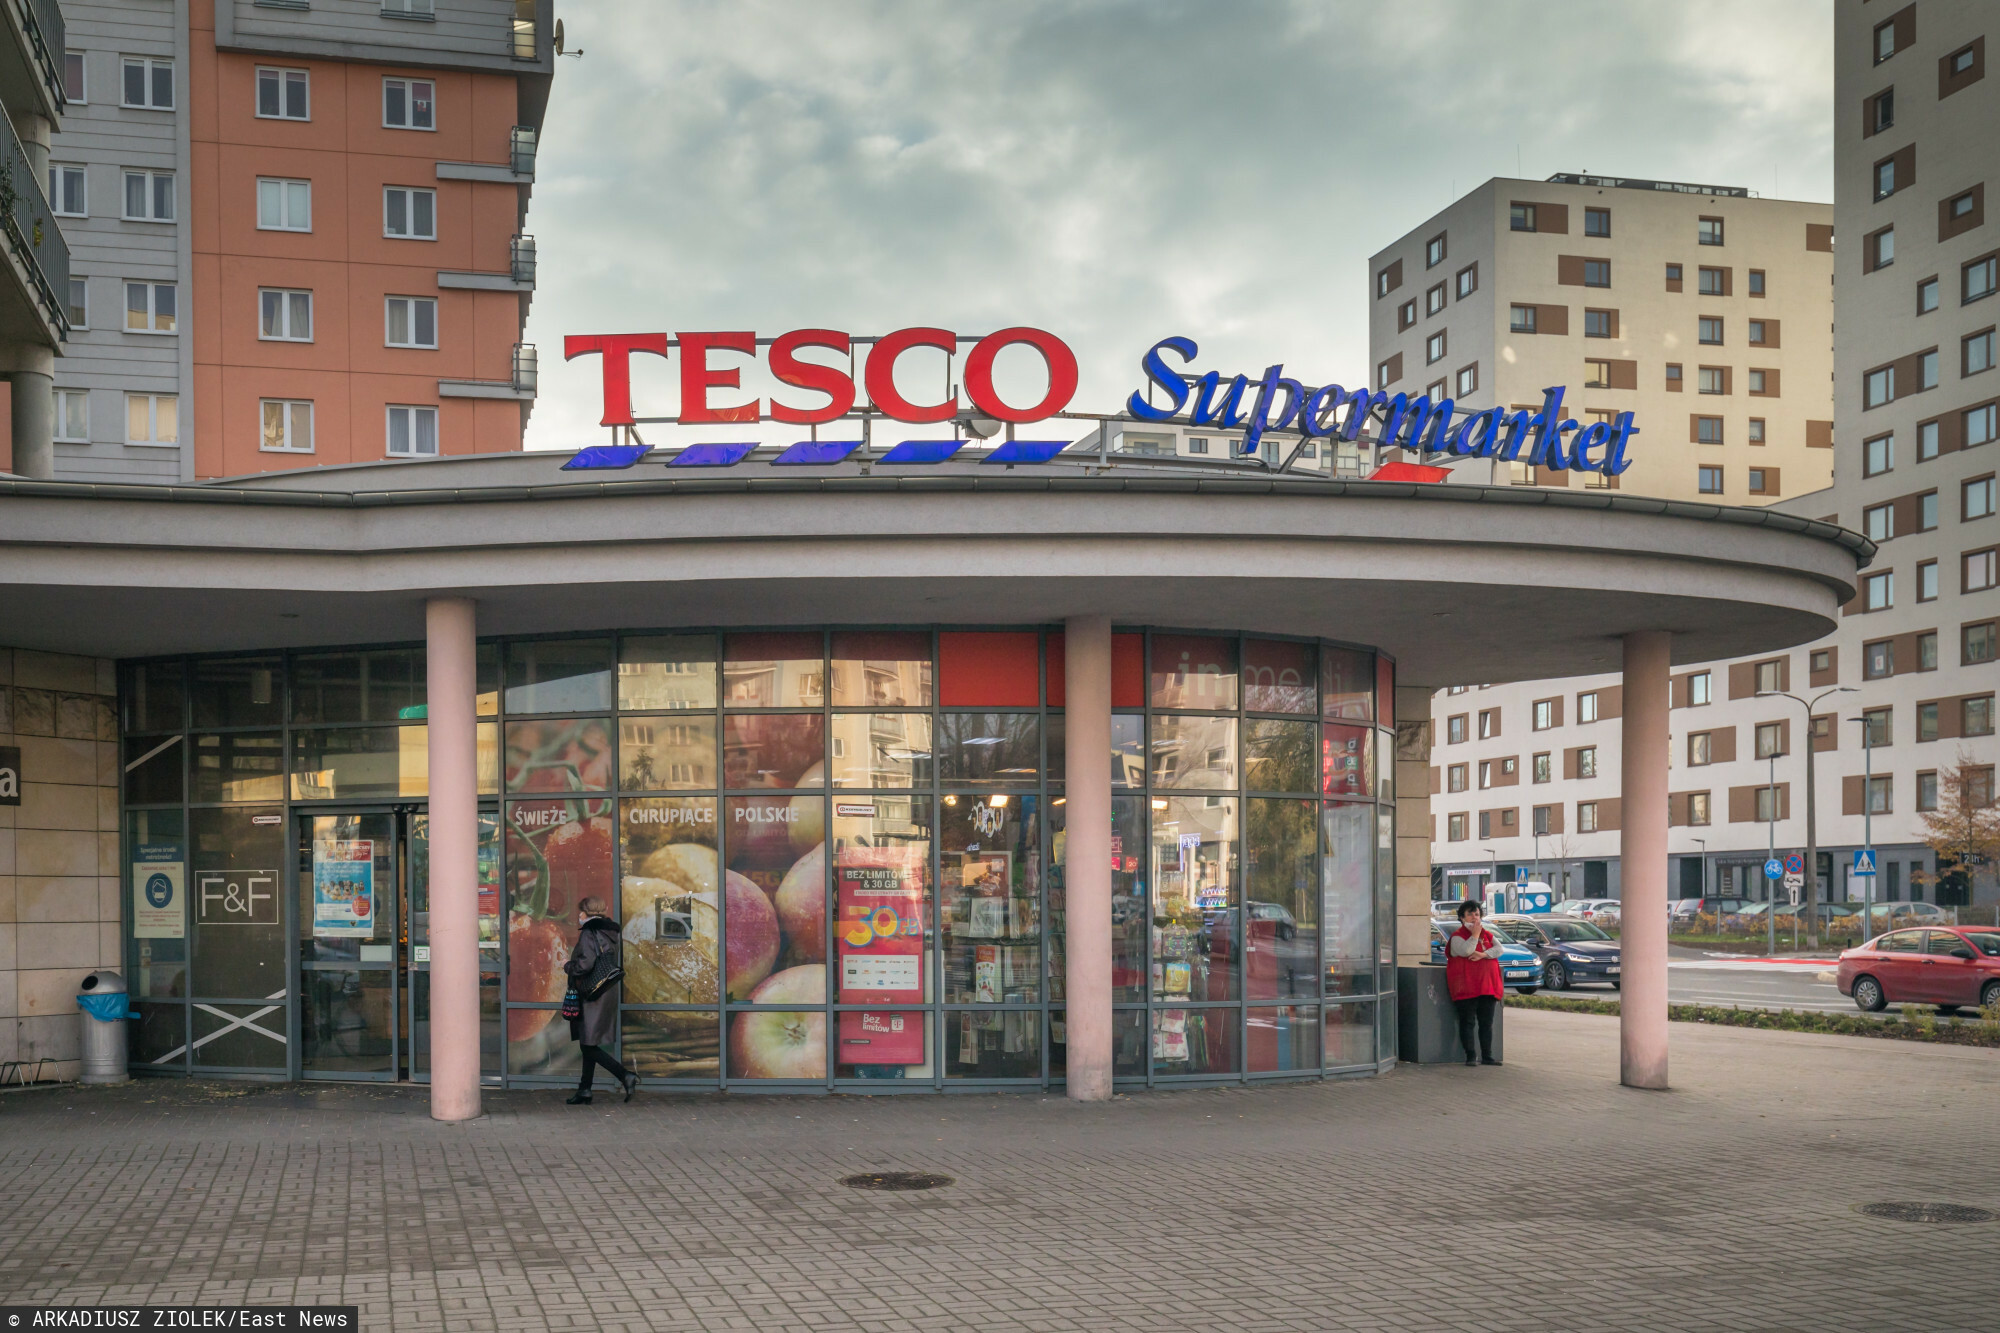 fot: Arkadiusz Ziolek/ East News. n/z Logo sieci handlowej Tesco Supermarket.